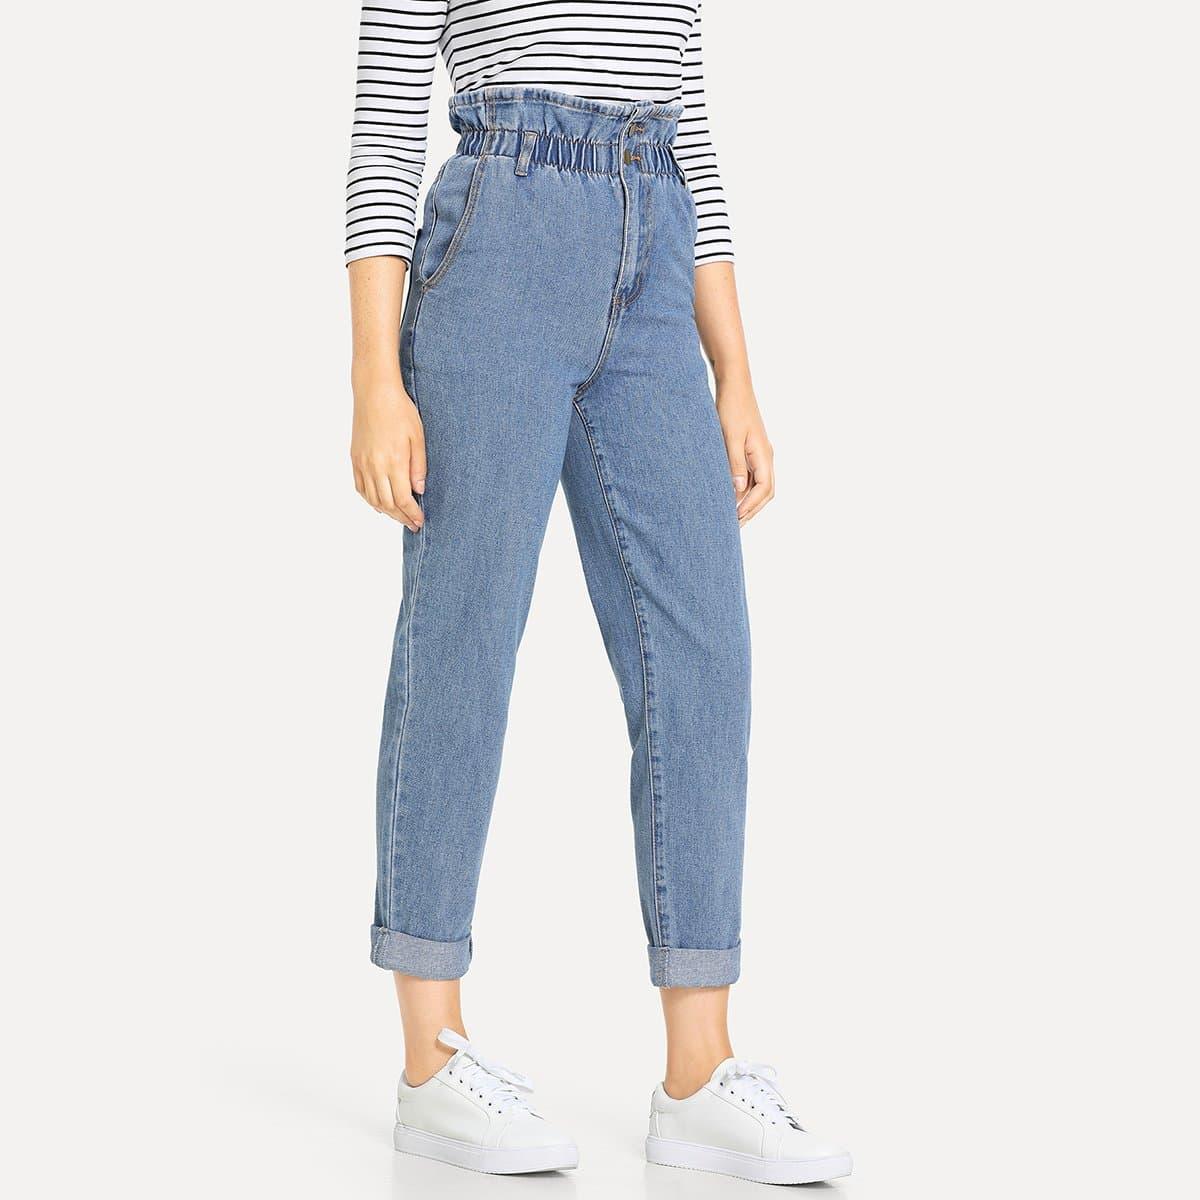 Jeans met hoge paperbag taille en opgerolde pijpen